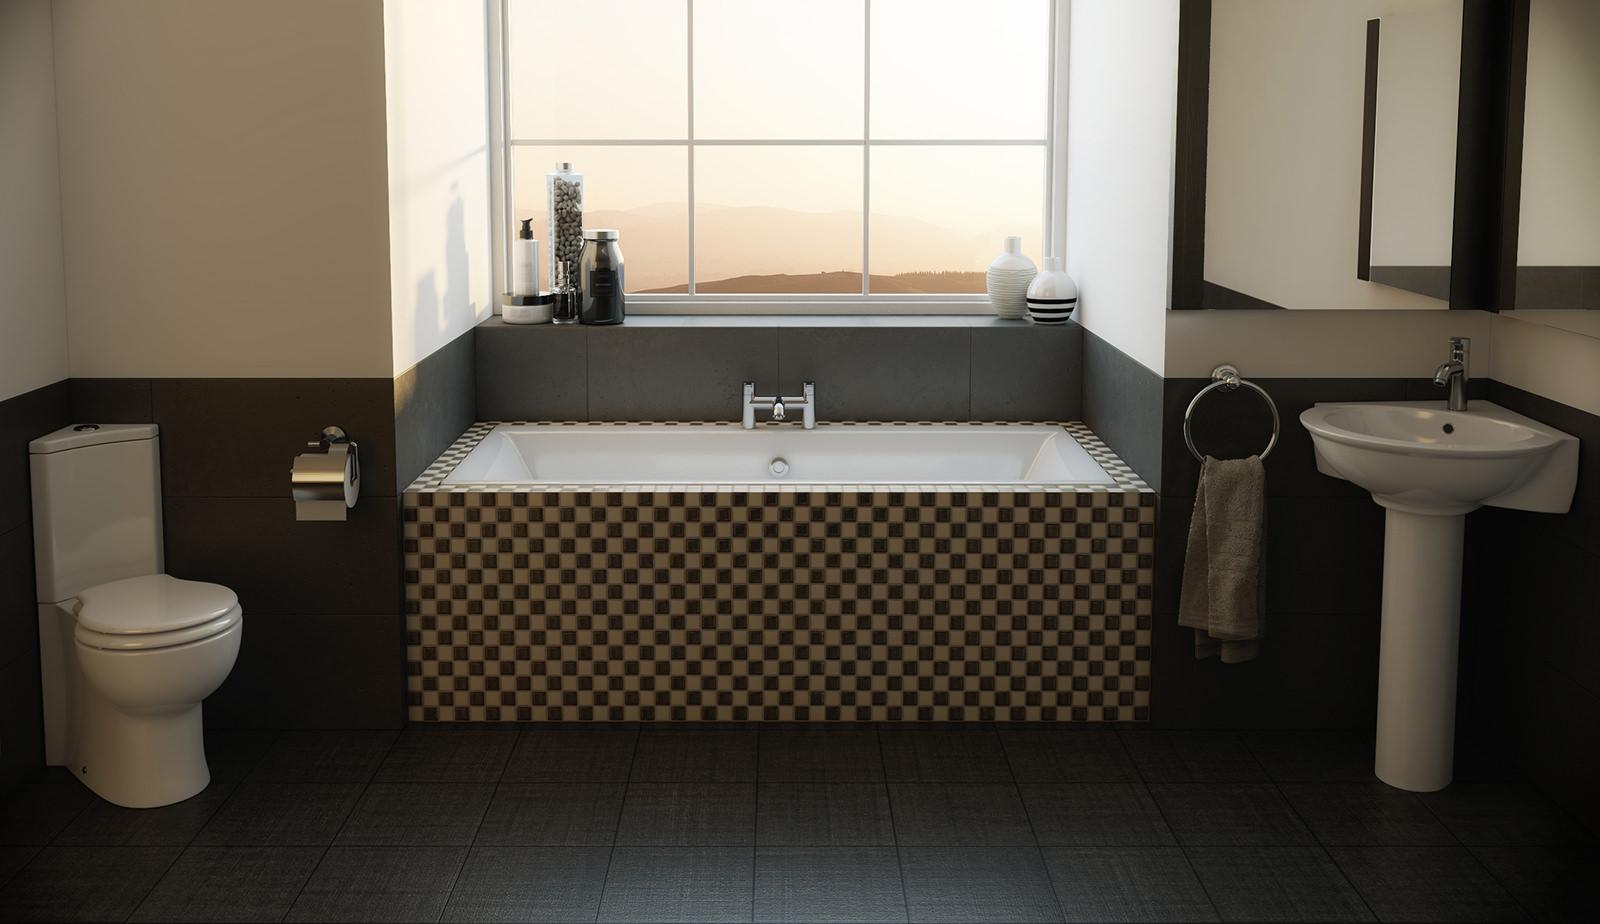 Rak bathroom suites - Rak Bathroom Suites 53